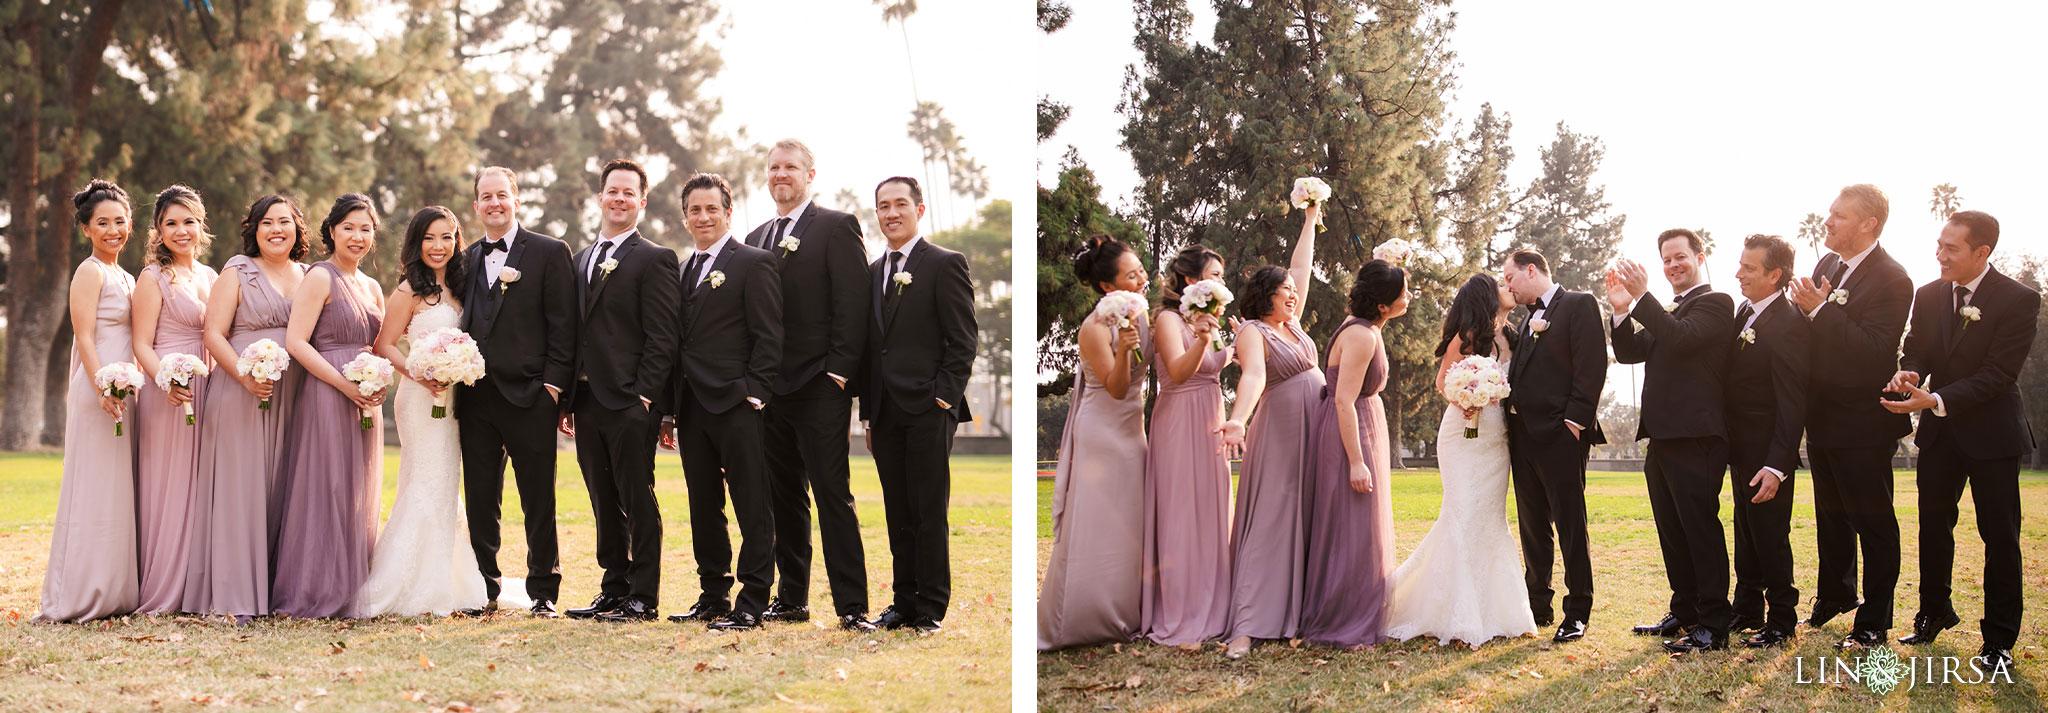 19 vertigo banquet hall glendale wedding photography